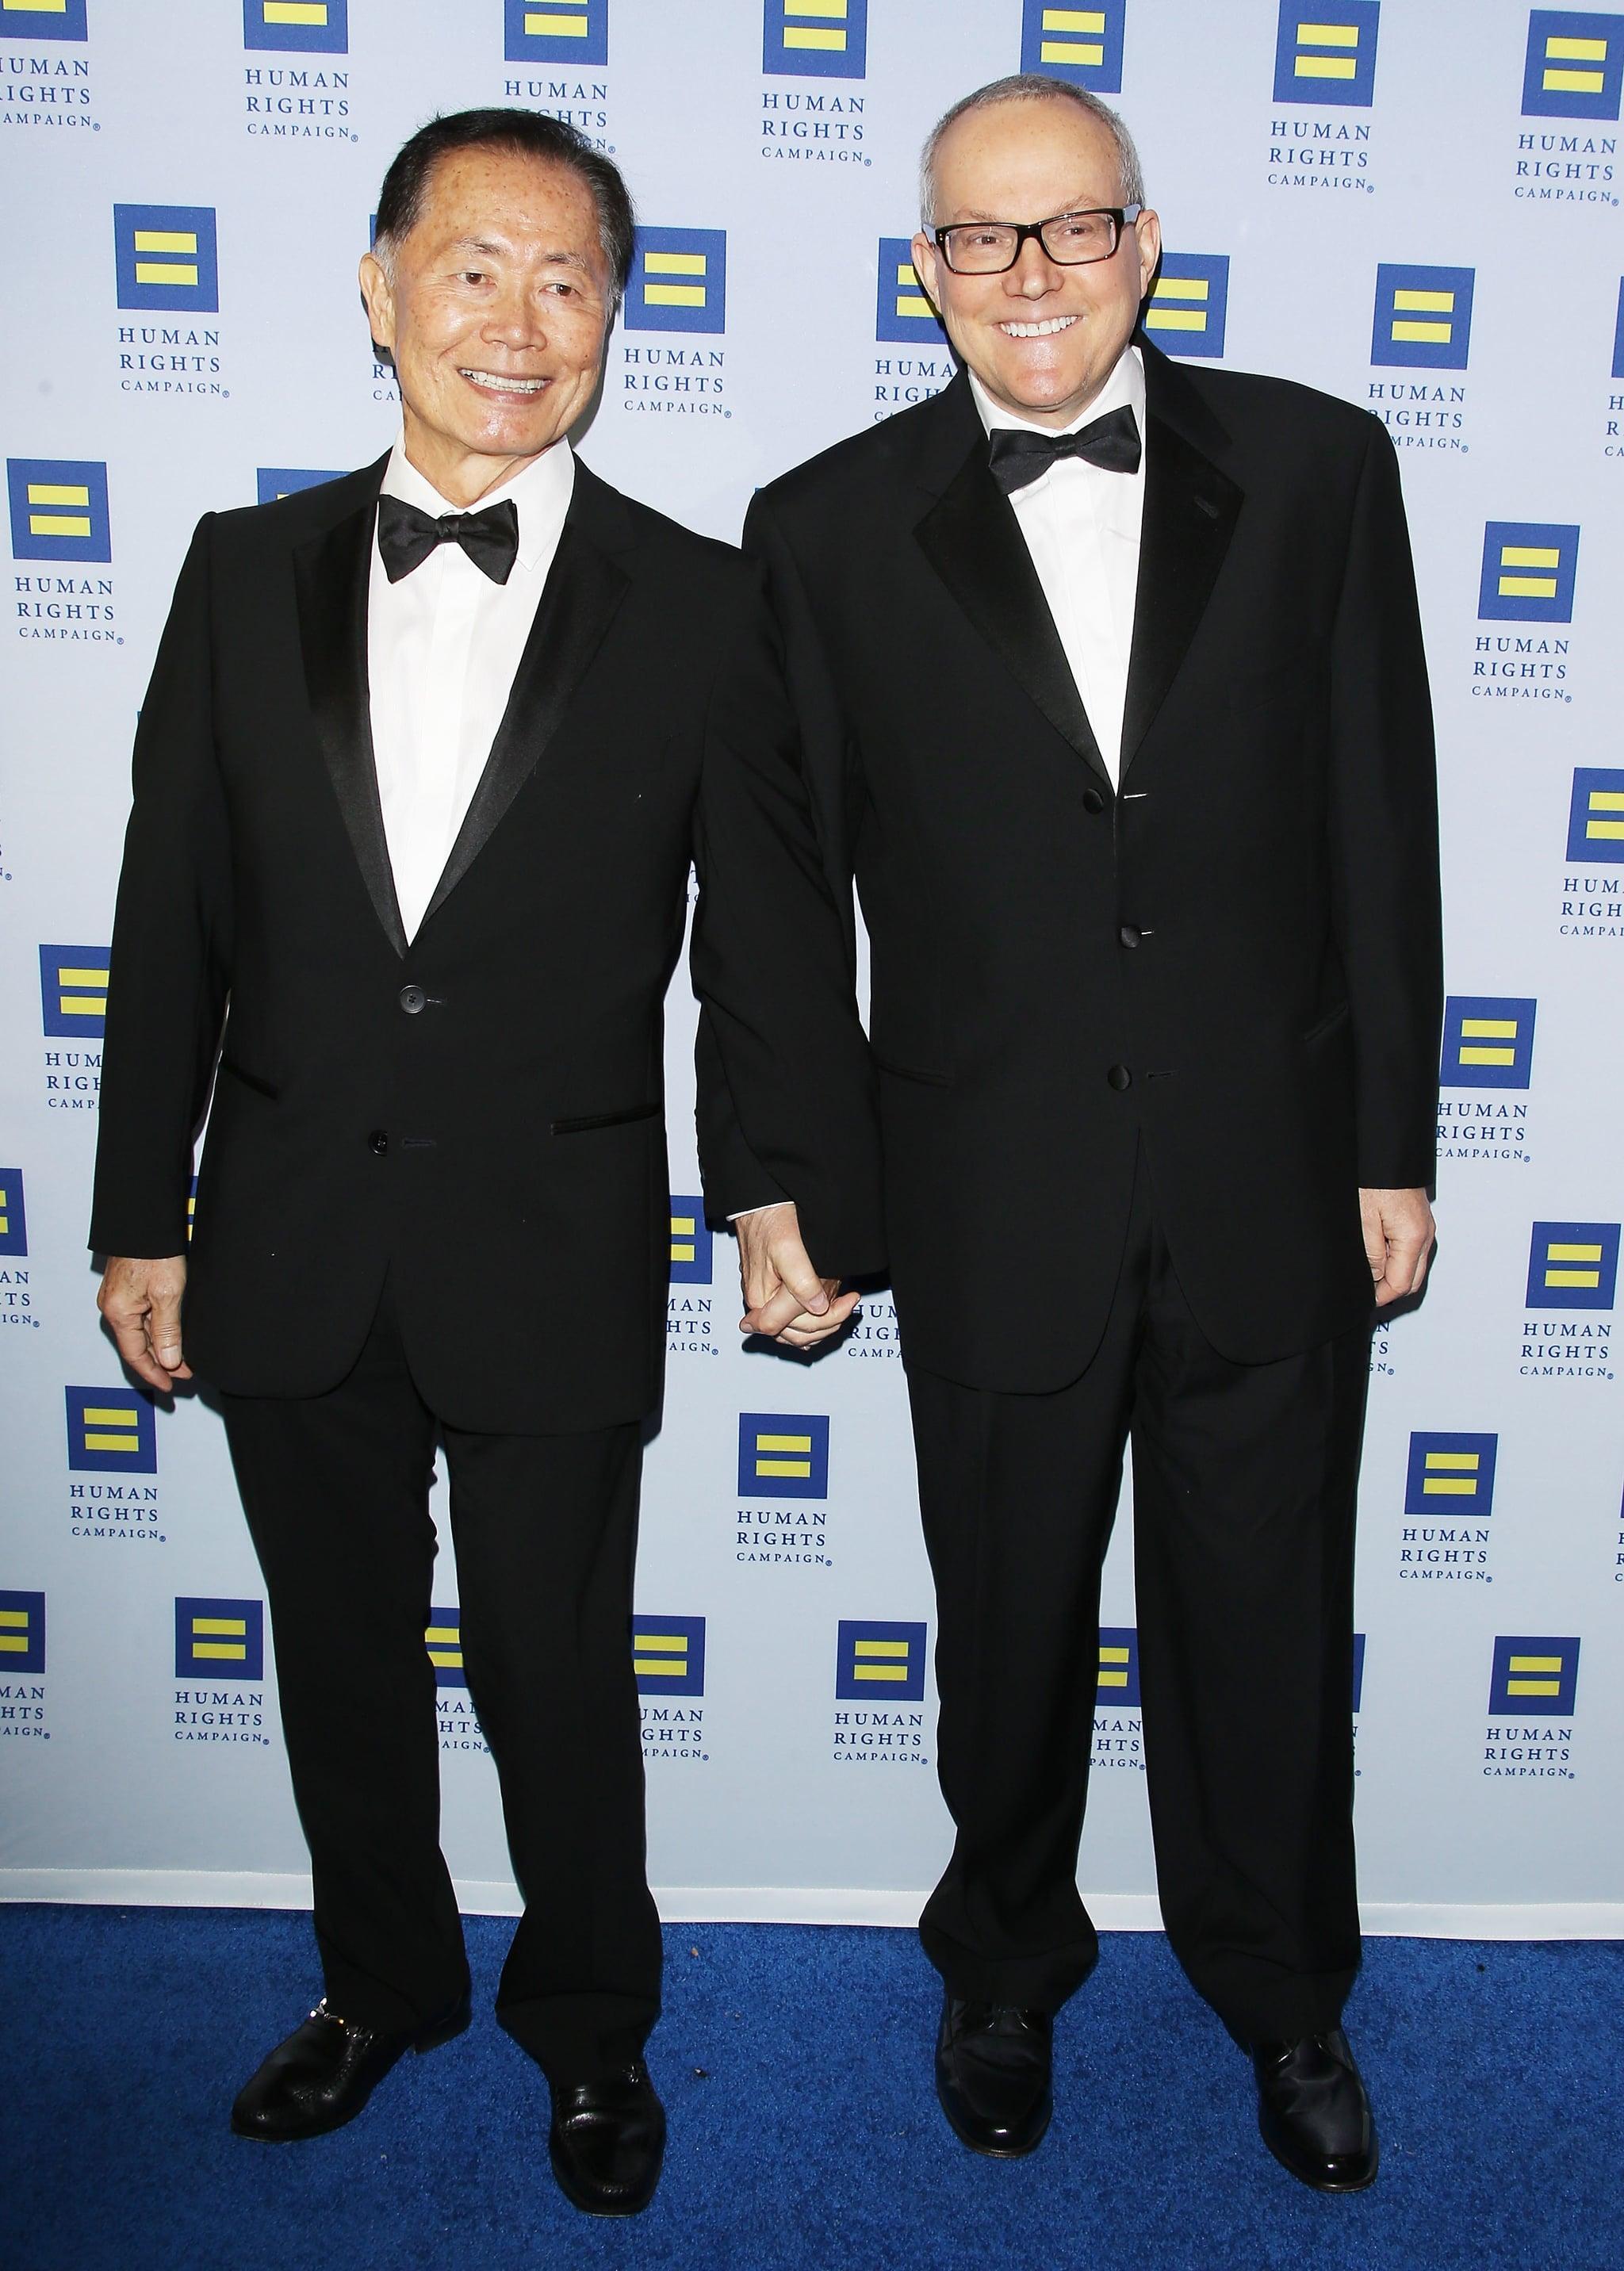 George Takei and Brad Altman